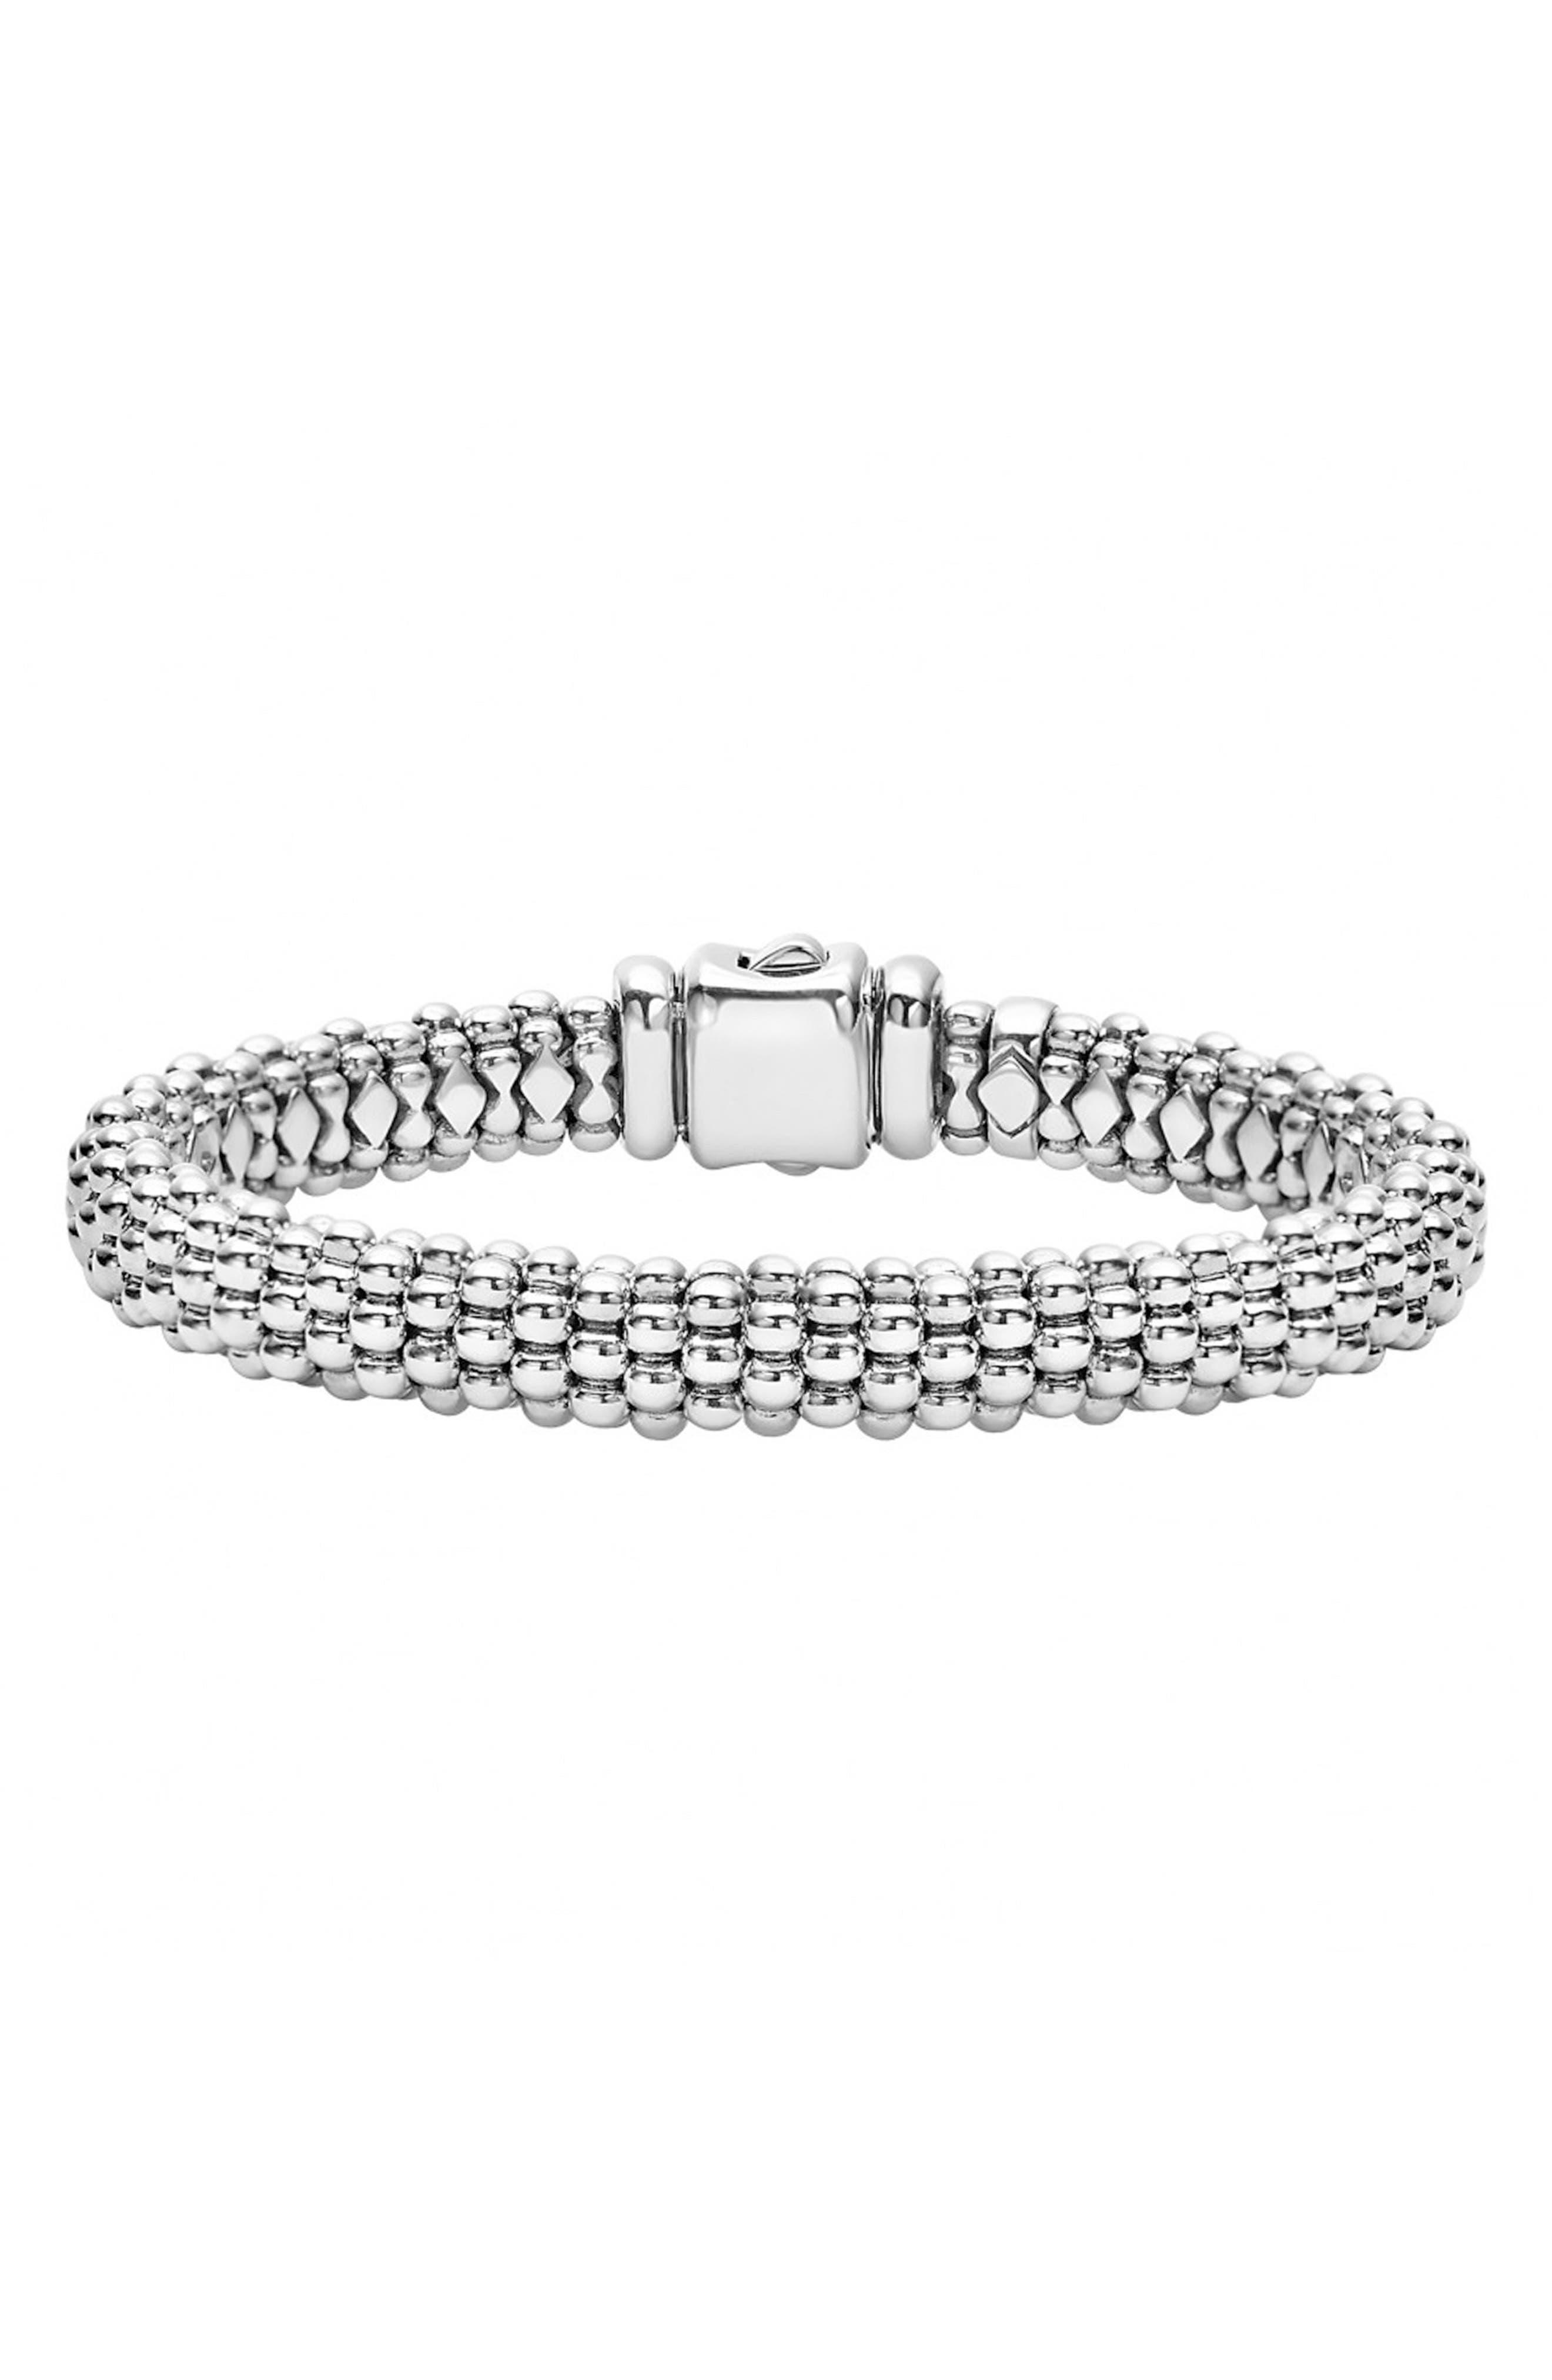 Caviar Rope Bracelet,                         Main,                         color, Silver